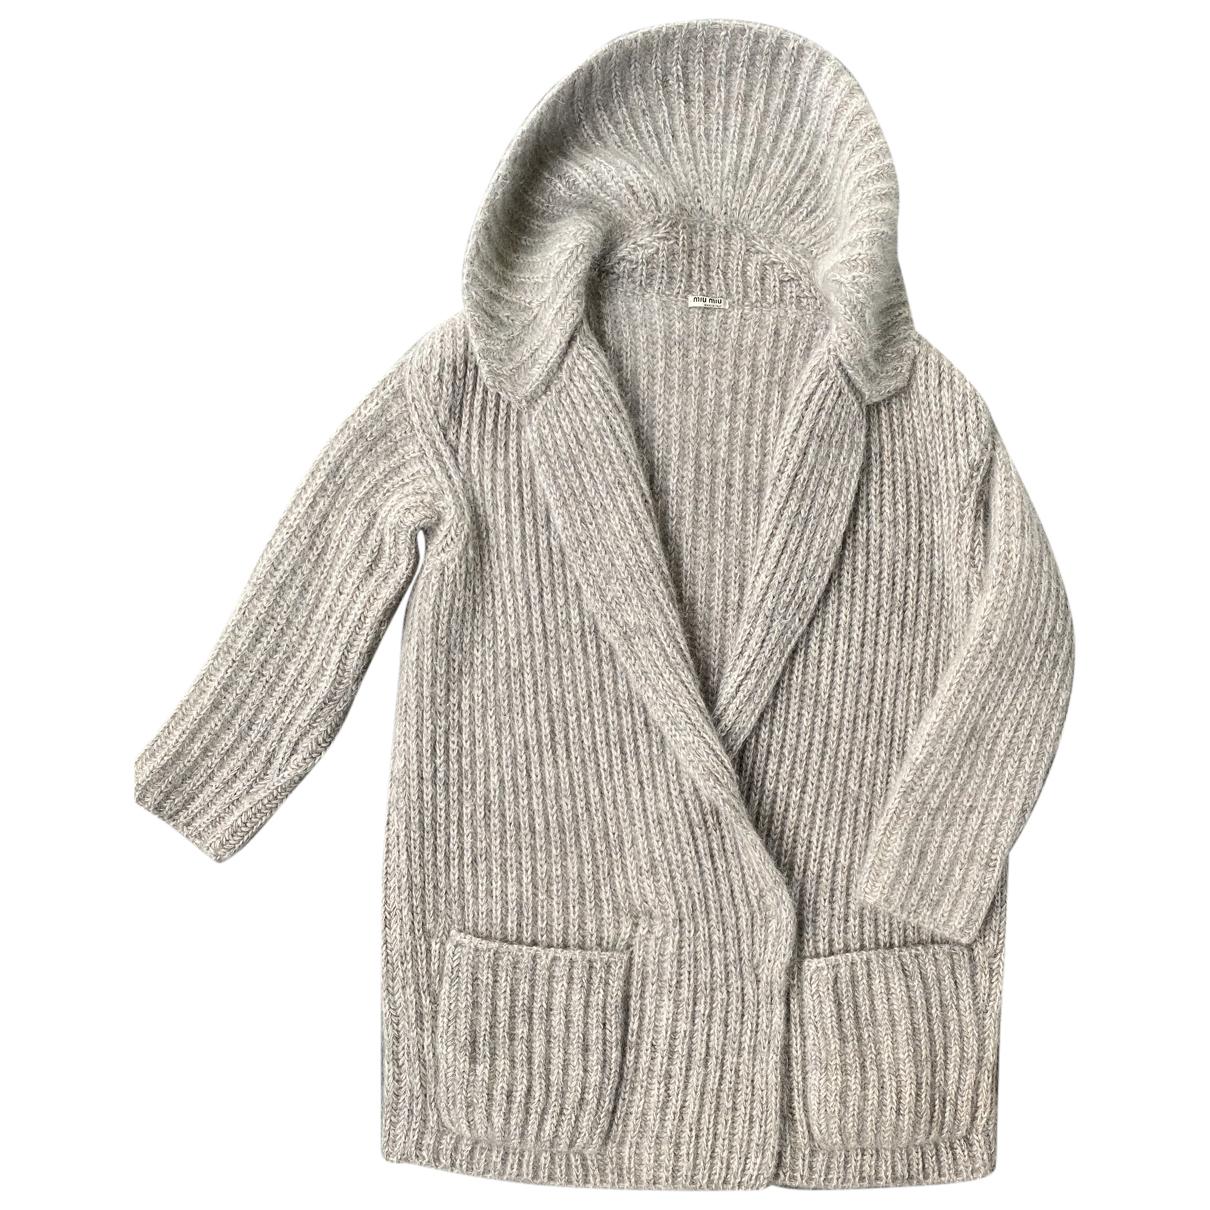 Miu Miu \N Pullover in  Beige Wolle